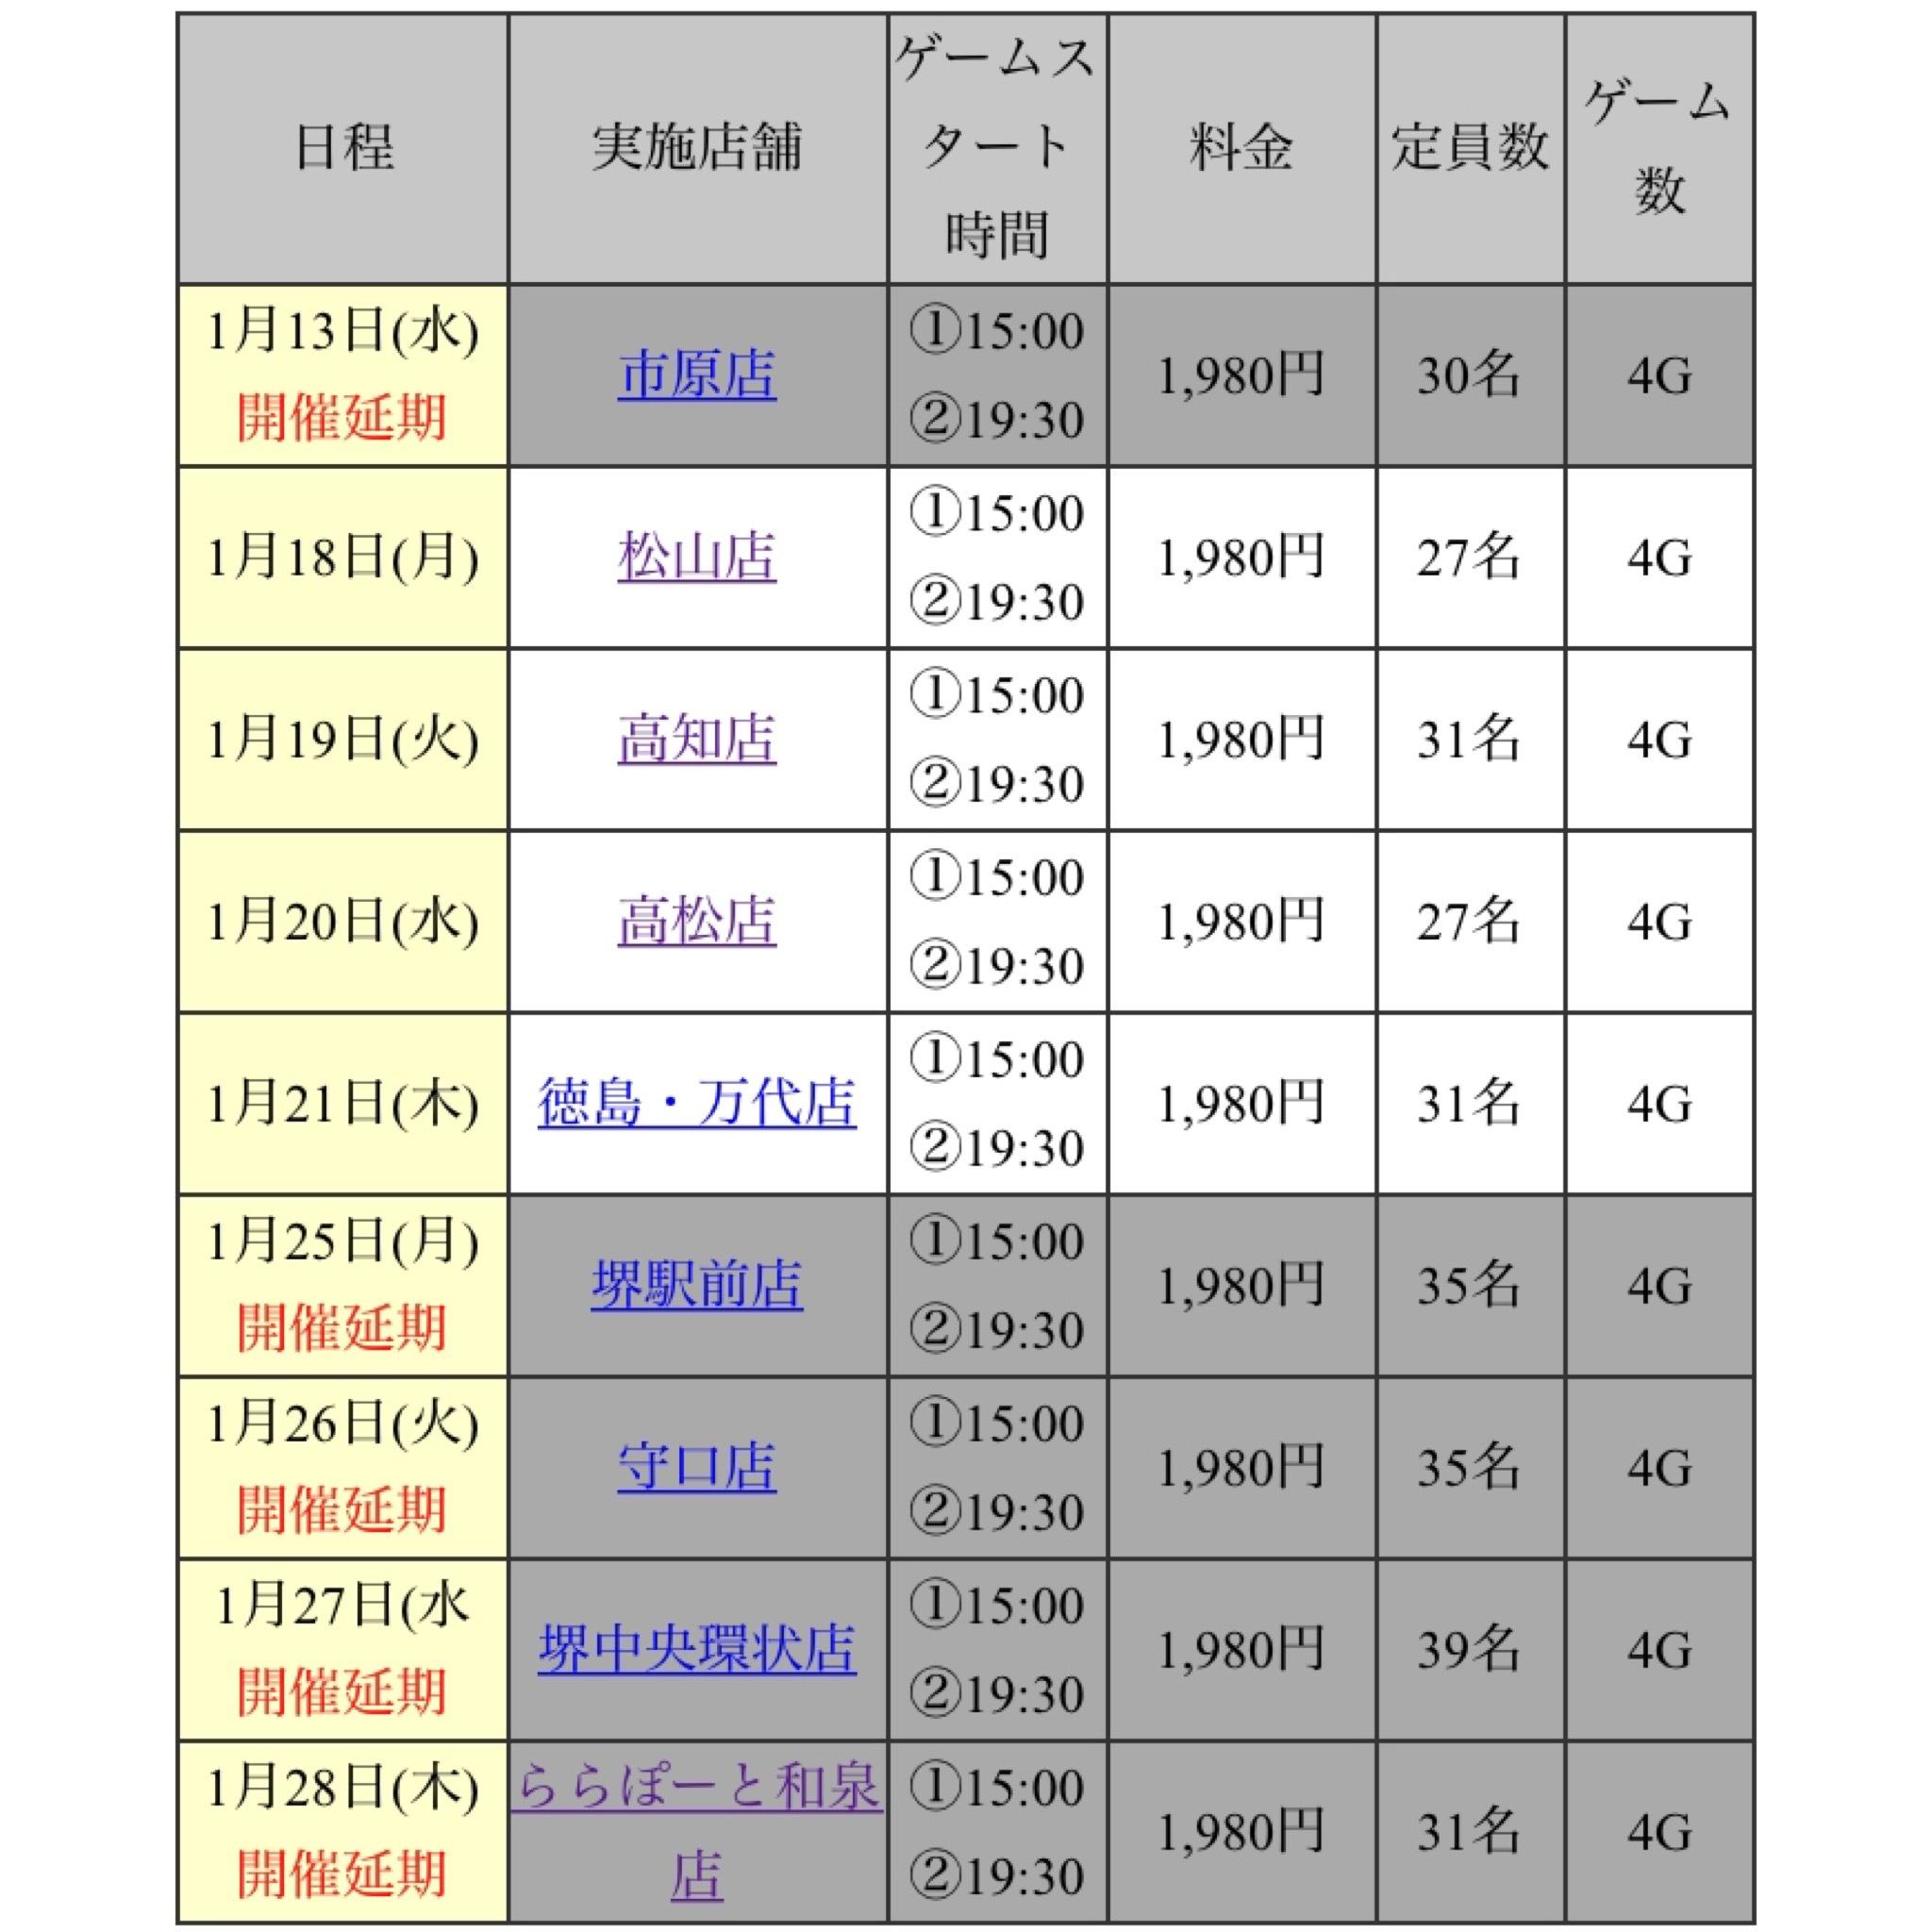 6F24EB9D-79BC-4E01-97D9-17411721A51A.jpeg